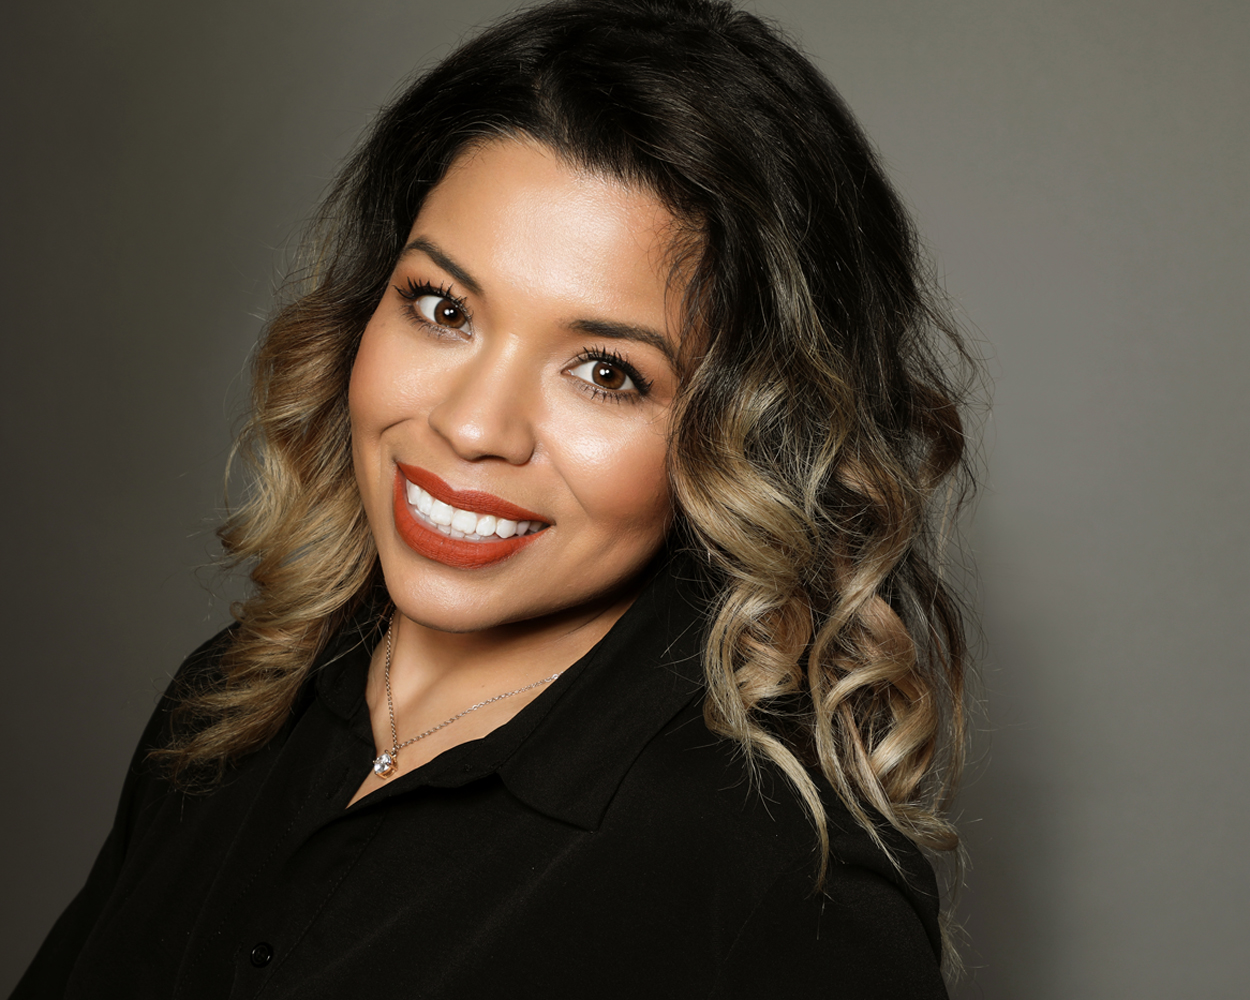 Diana Carrillo